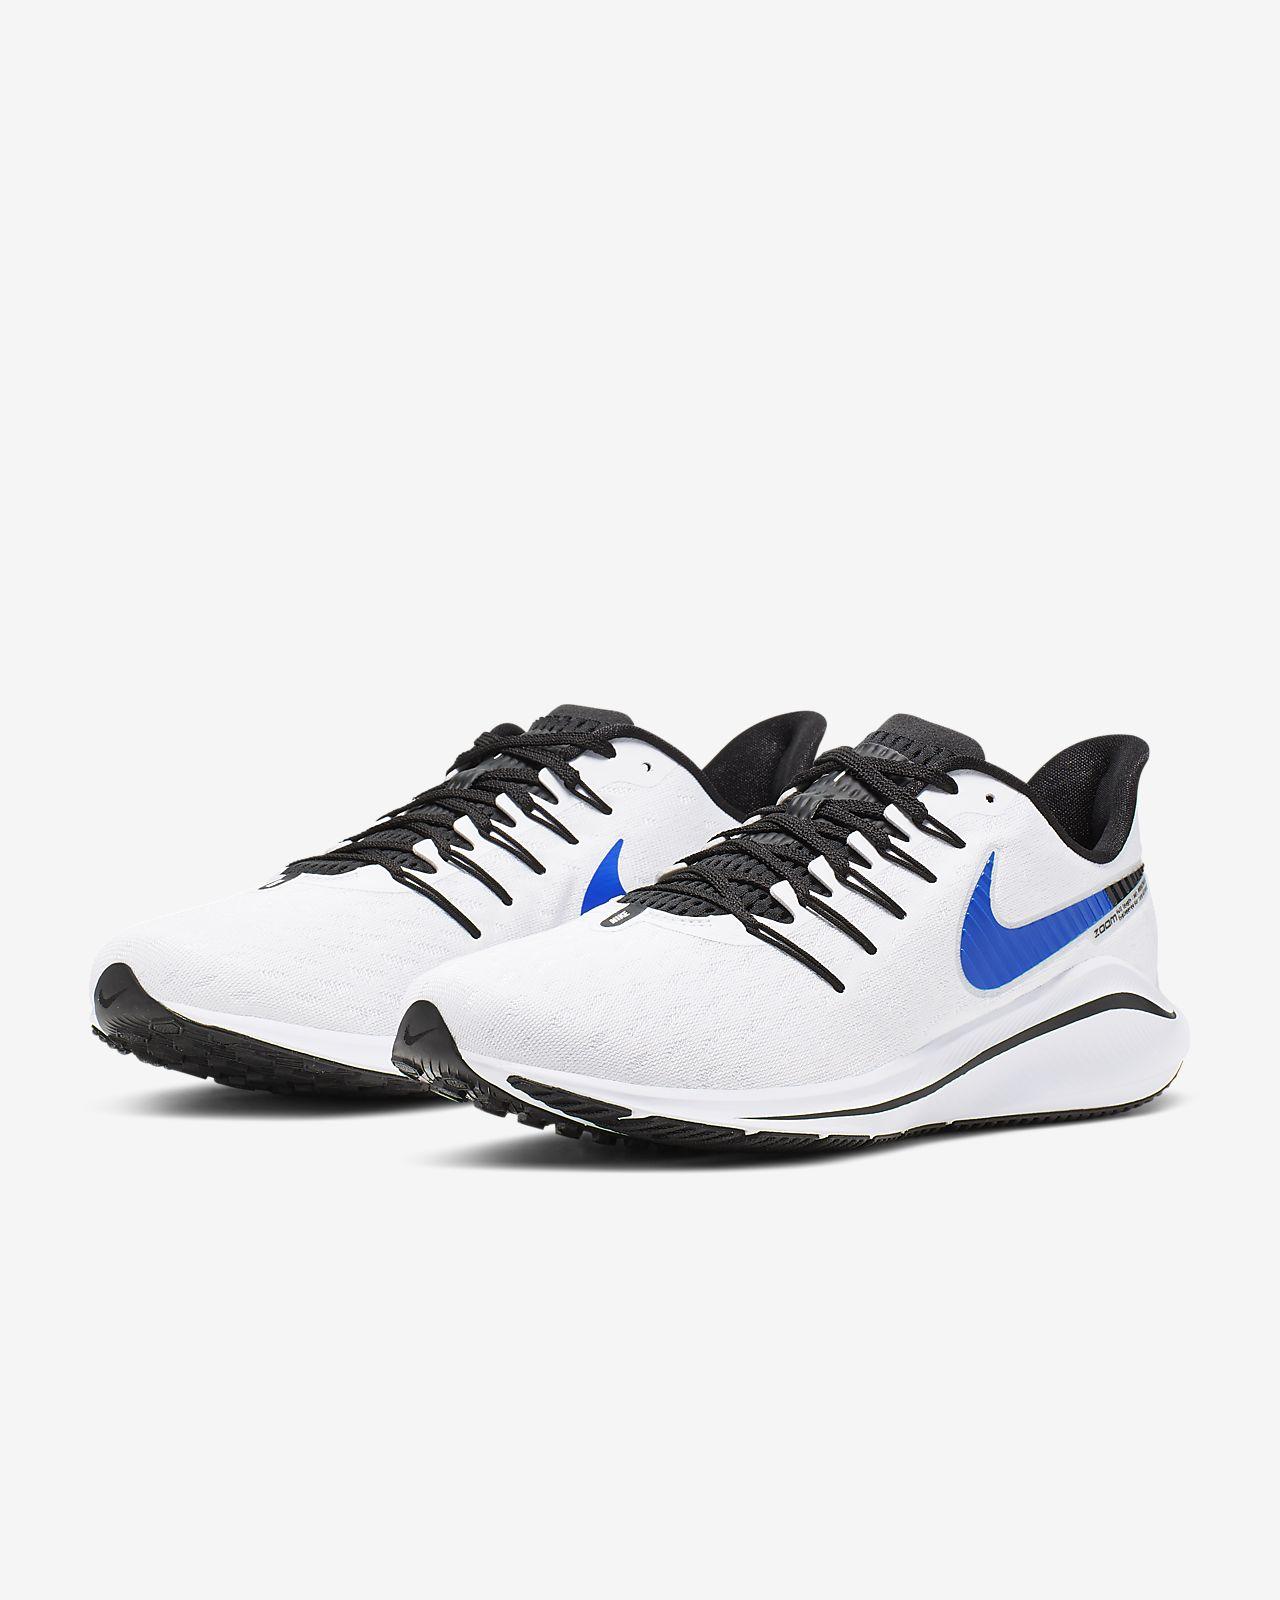 2c4a6b2898fad Nike Air Zoom Vomero 14 Men's Running Shoe. Nike.com CA